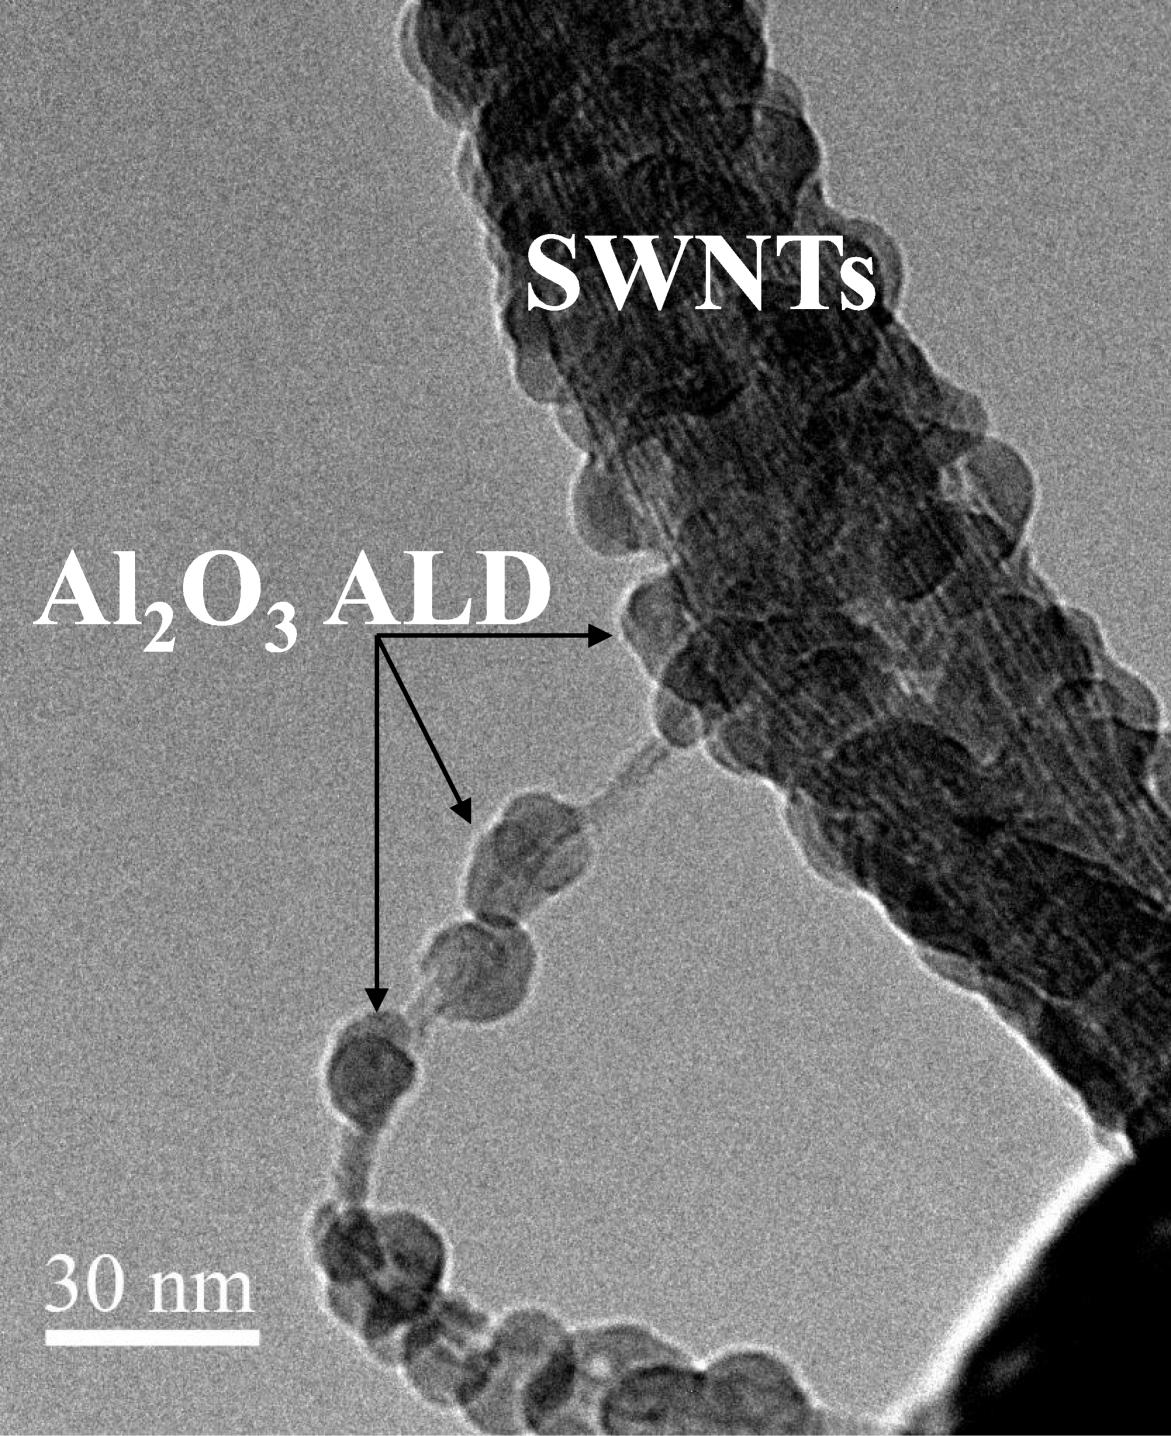 Particle Atomic Layer Deposition Springerlink Wiring Diagram Komatsu Ck 30 Open Image In New Window